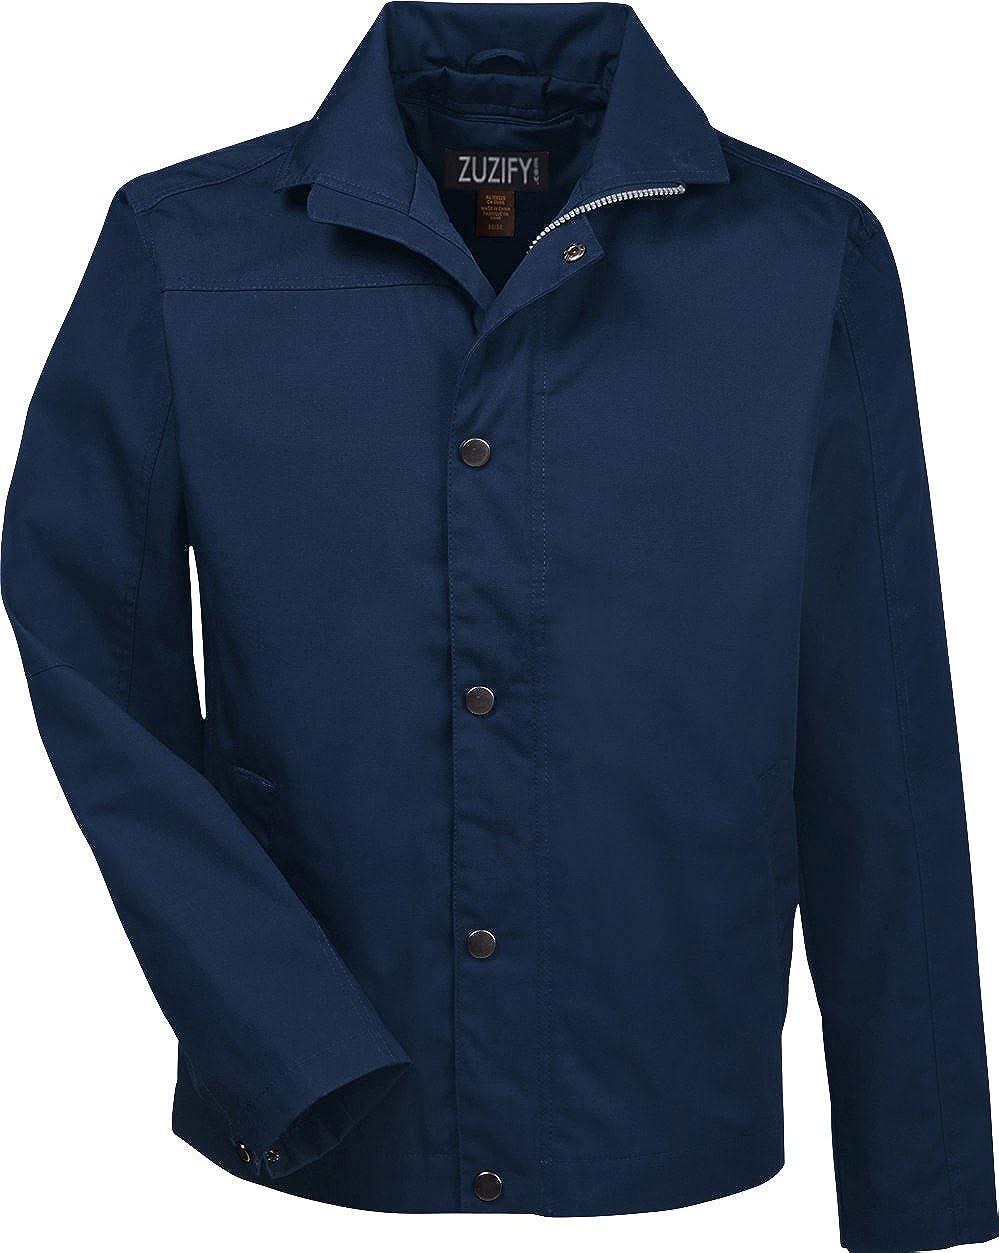 ZUZIFY Water-Resistant Canvas Work Jacket GR0844